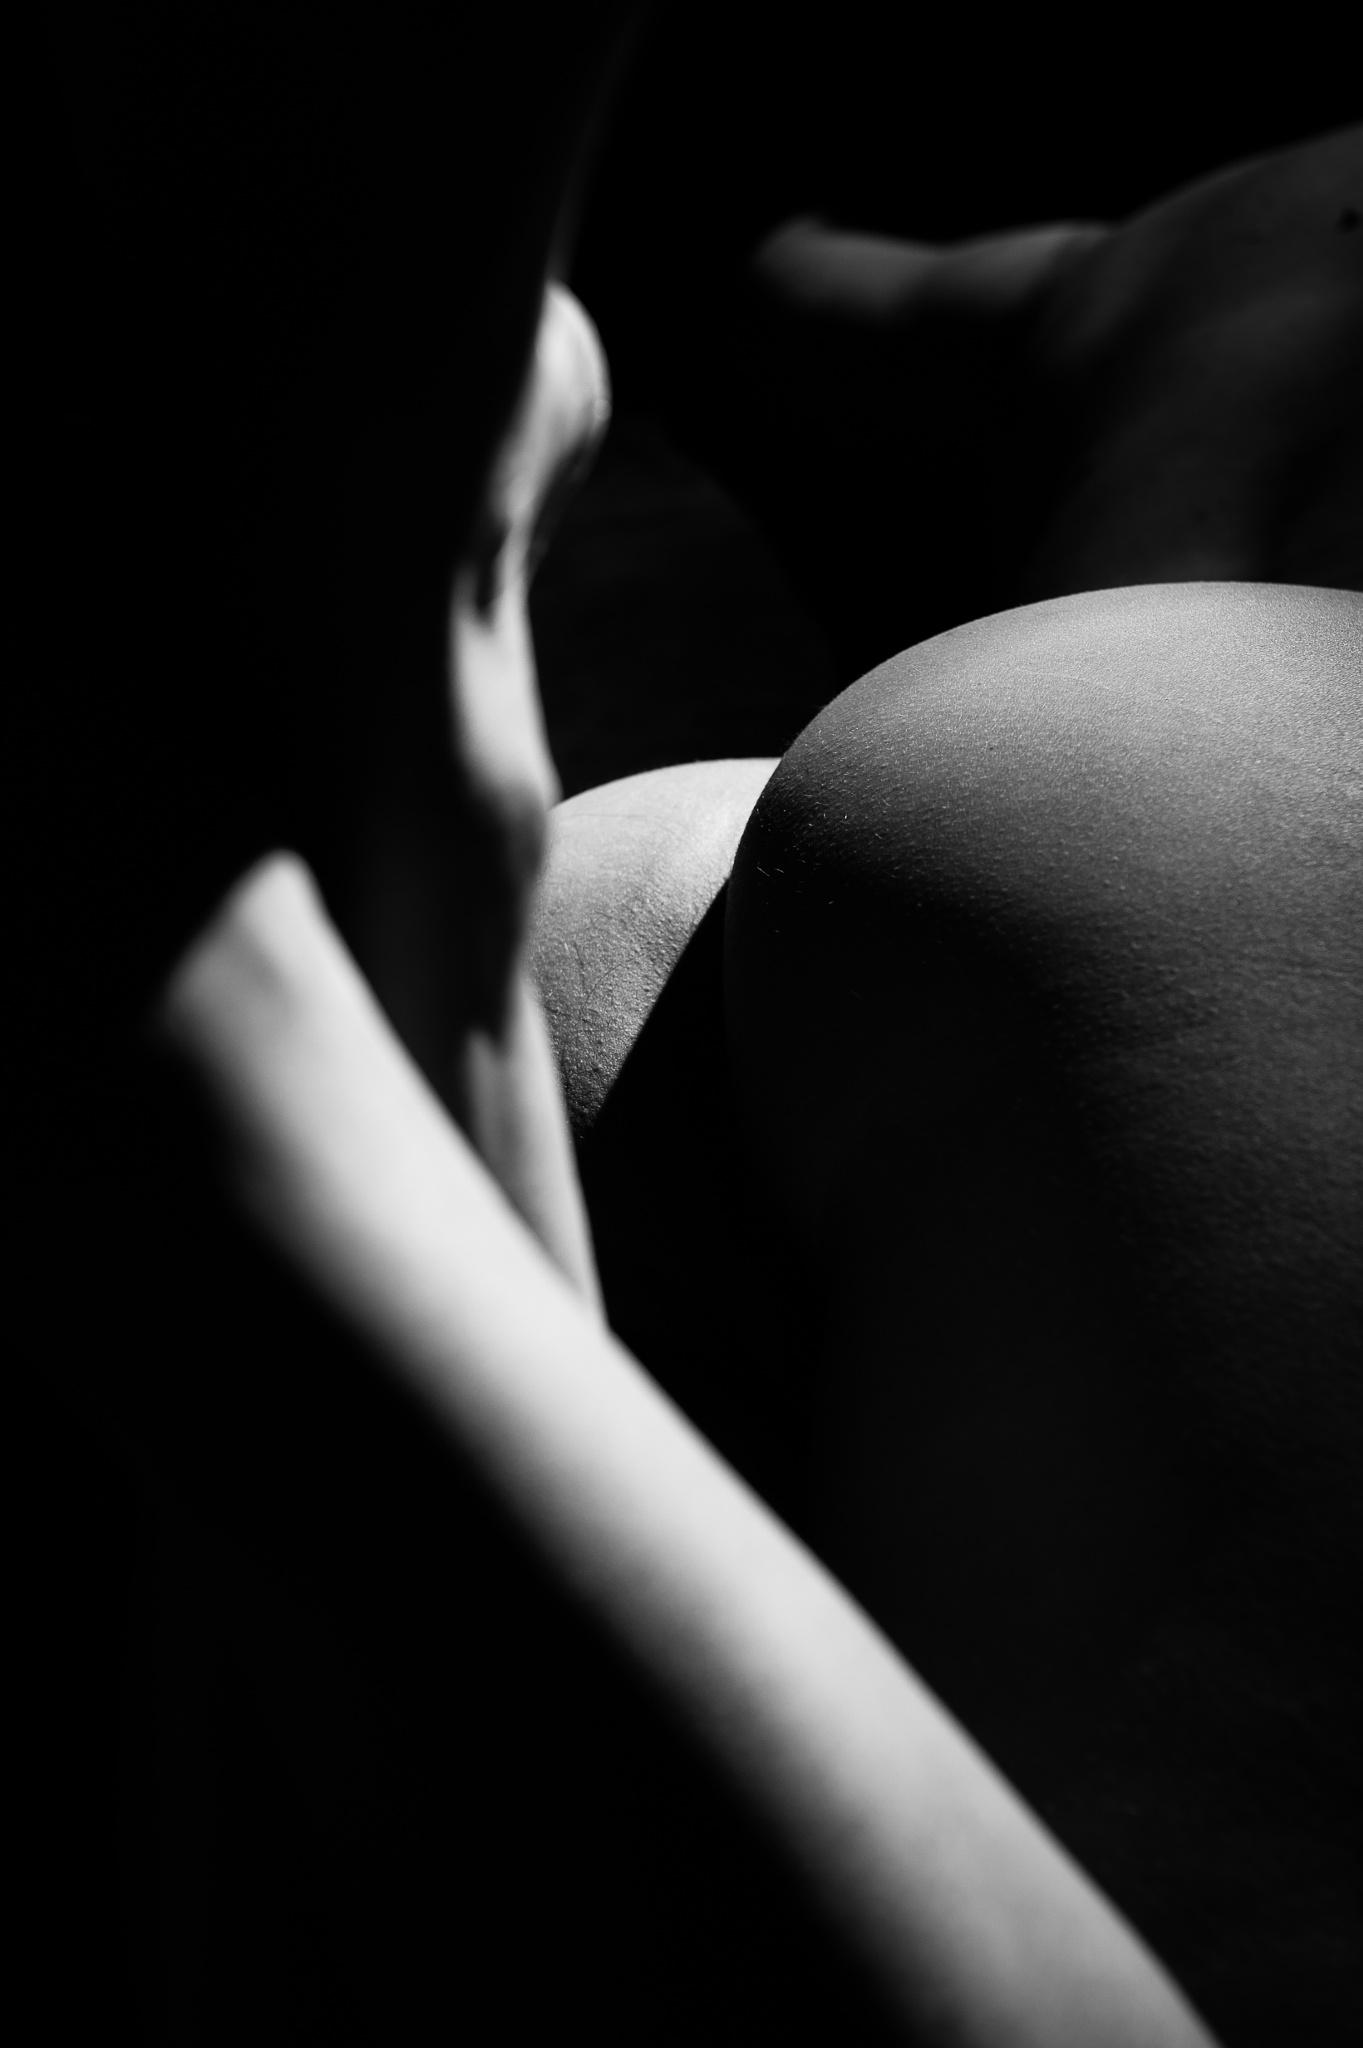 M. by Yann Texier